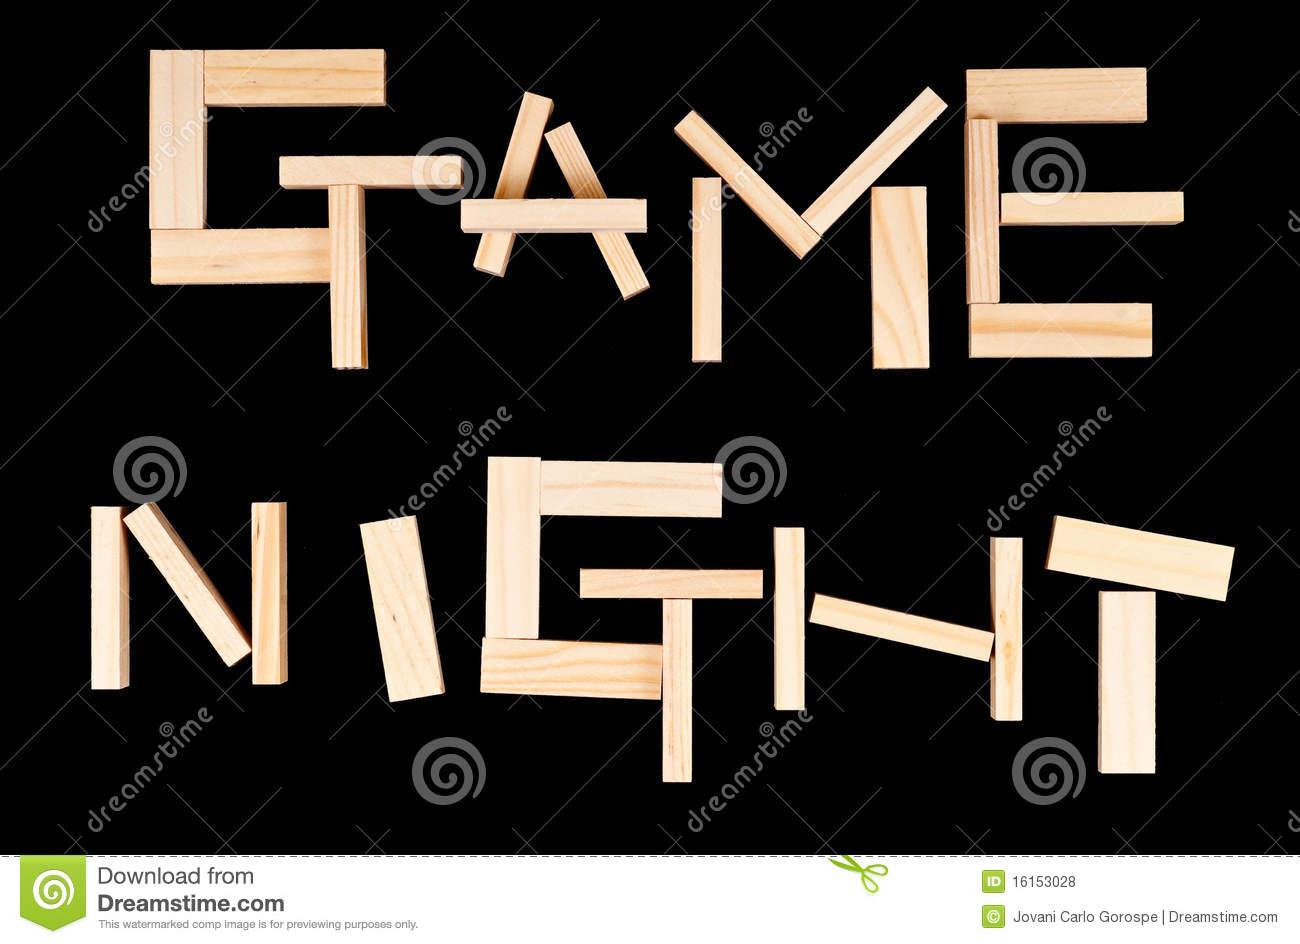 Game Night Royalty Free Stock Photos Ima-Game Night Royalty Free Stock Photos Image 16153028-15